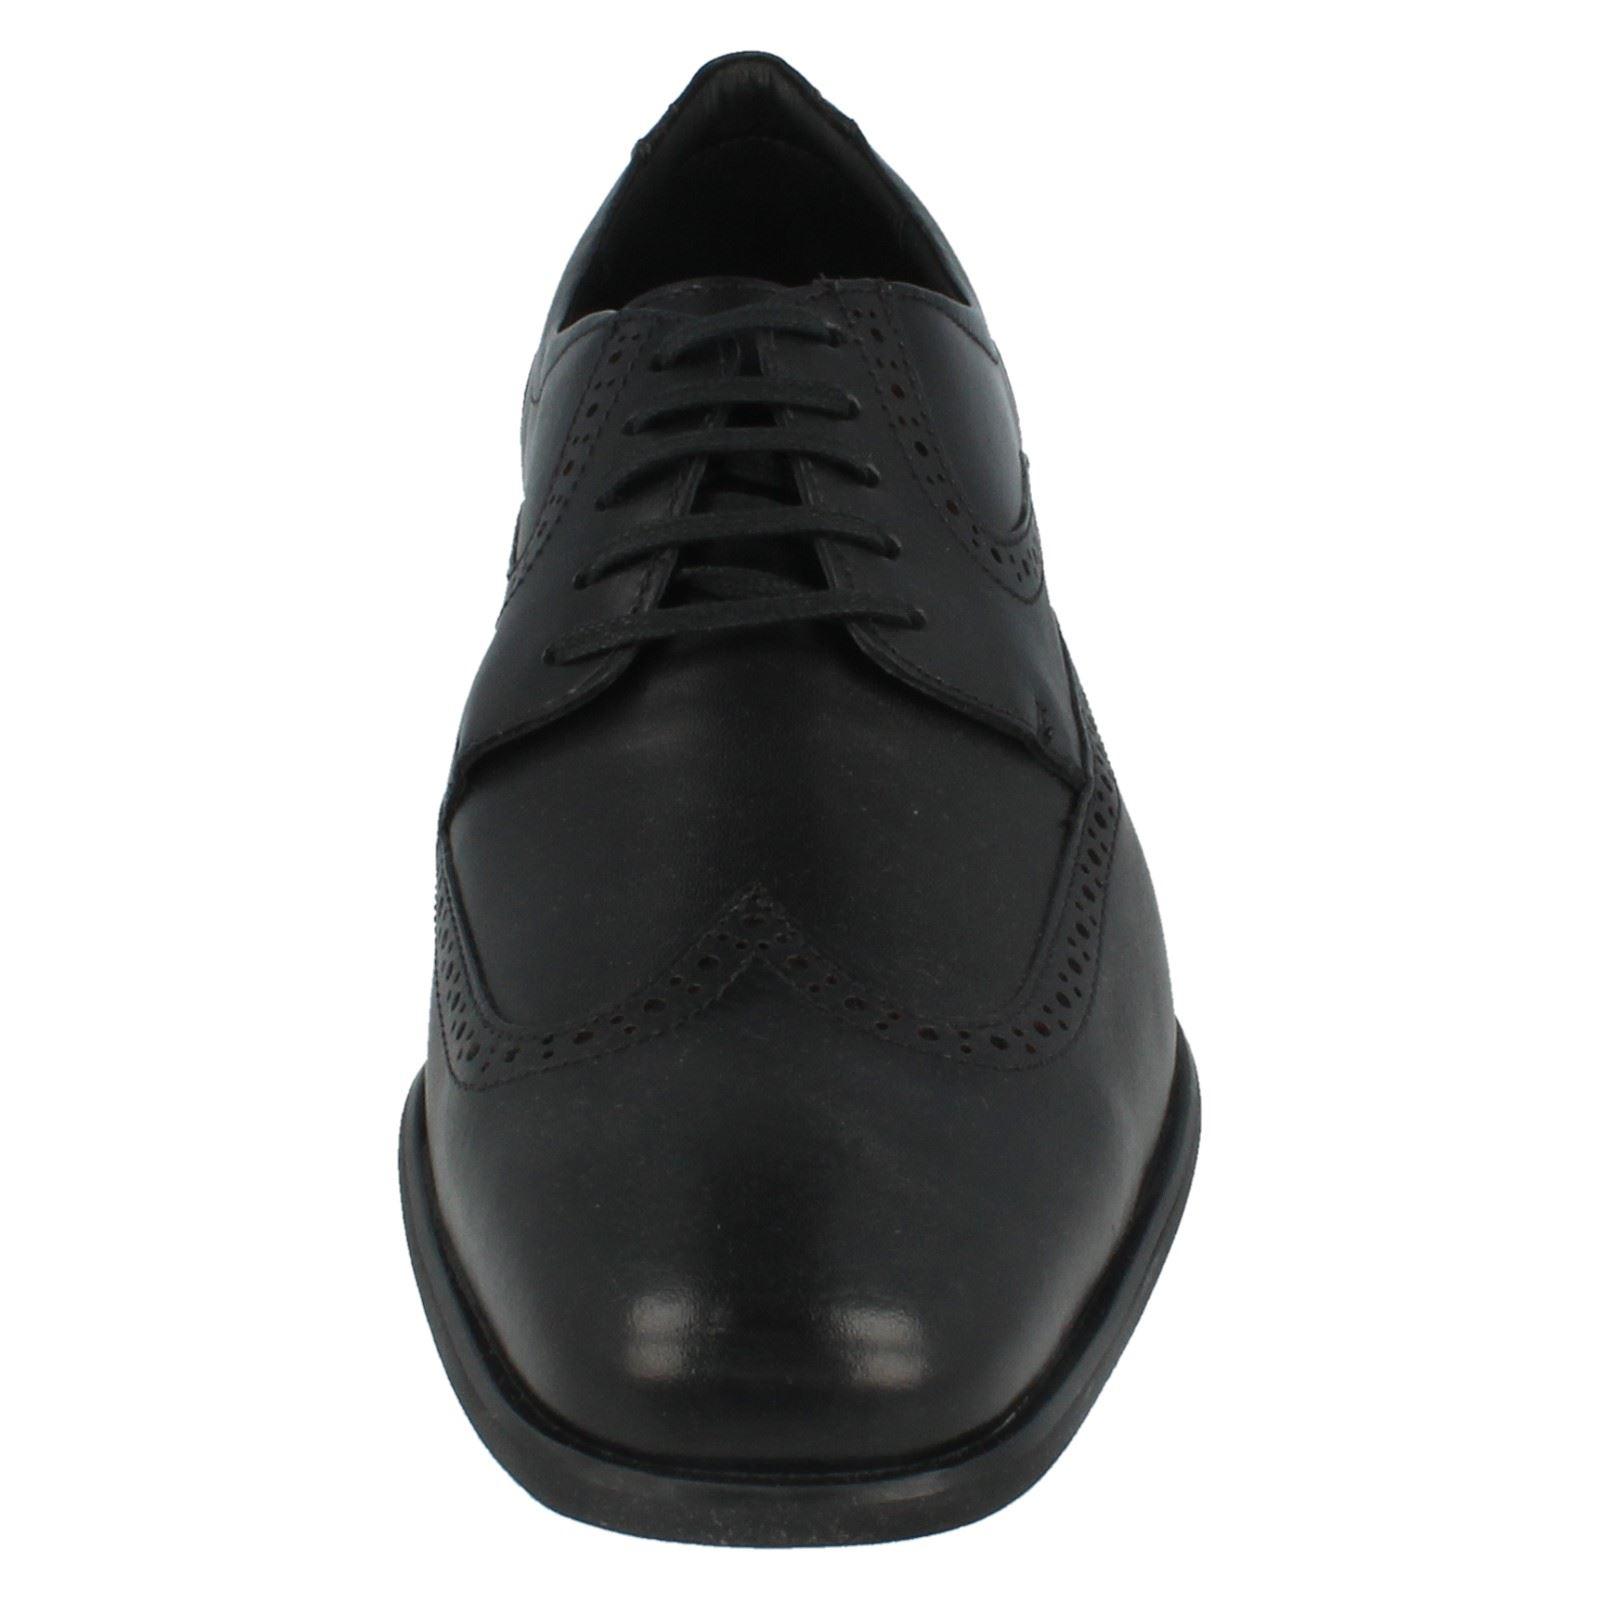 Herren Anatomic & Co Wing Cap Lace Up  Schuhe Label Panapolis  Up N 755d10